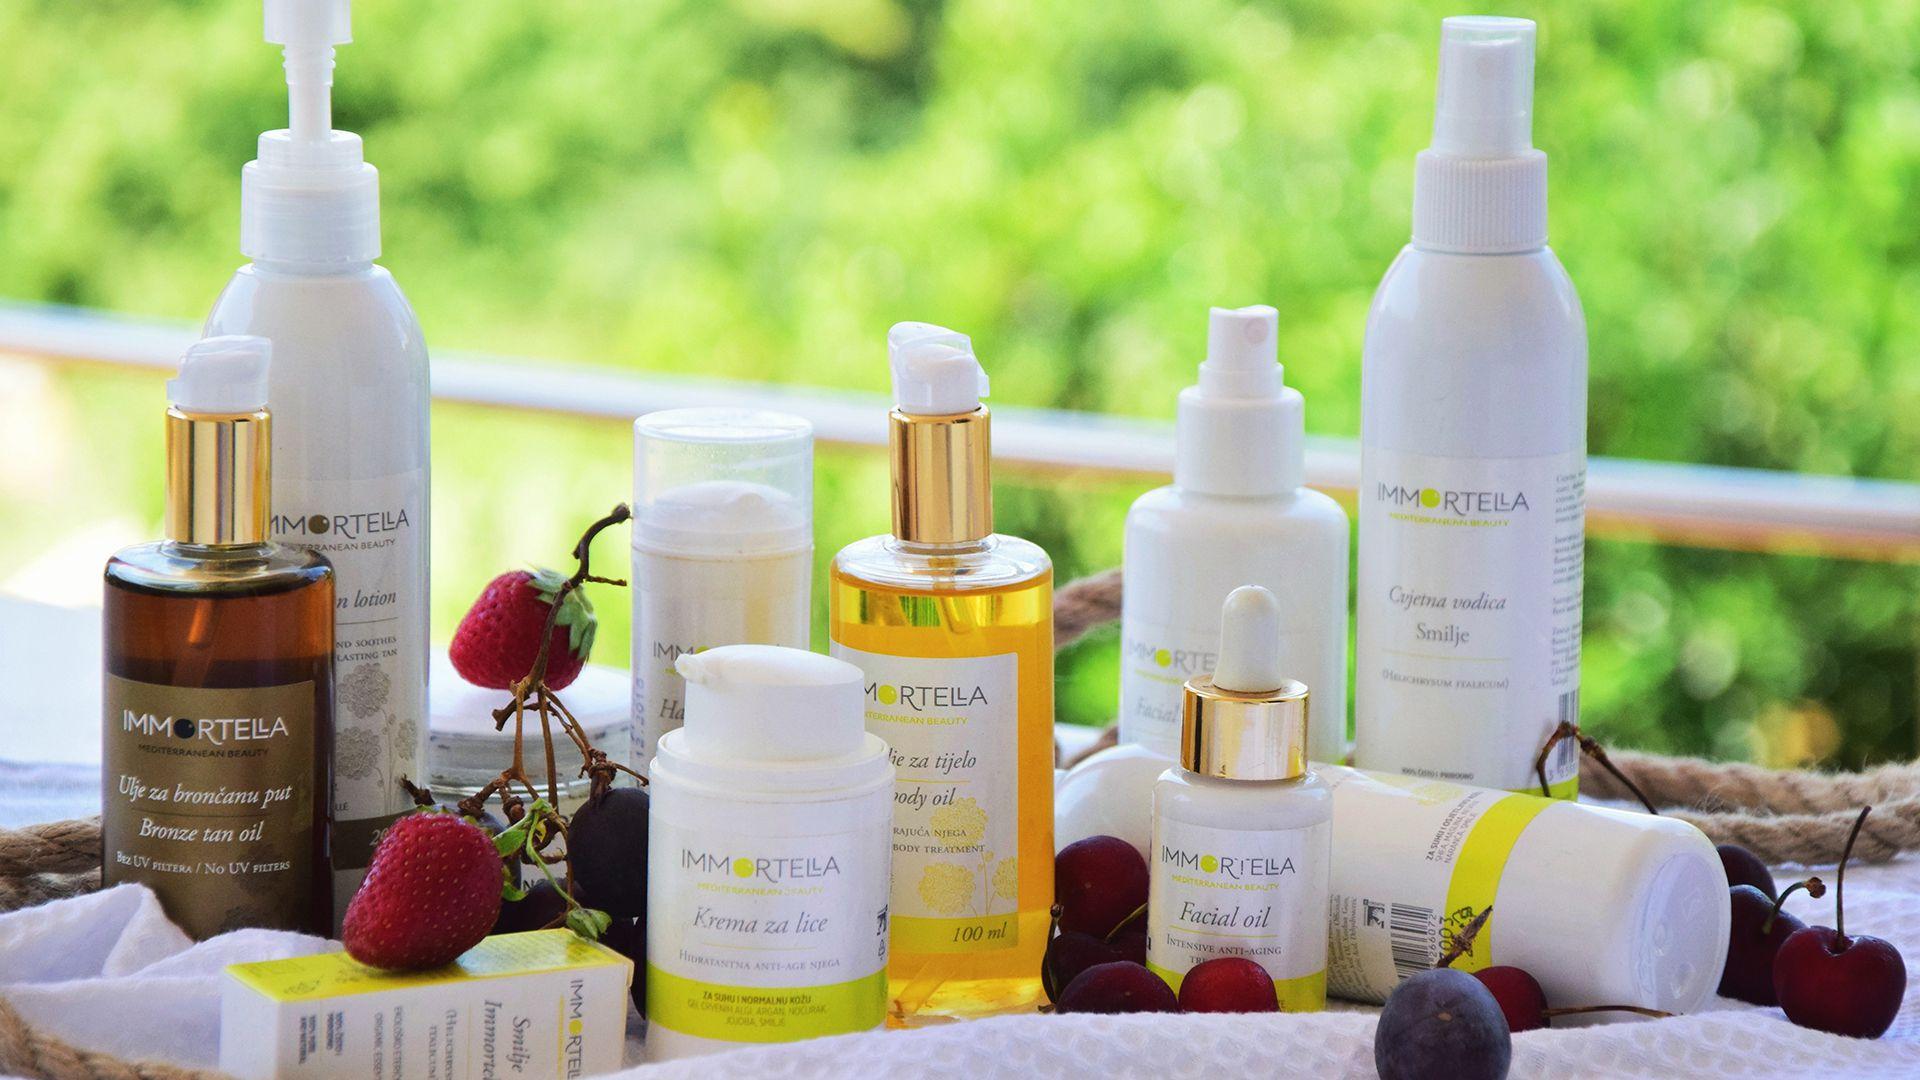 Upoznajte novi brend svježe prirodne kozmetike inspiriran Mediteranom IMMORTELLA - Mediterranean beauty!